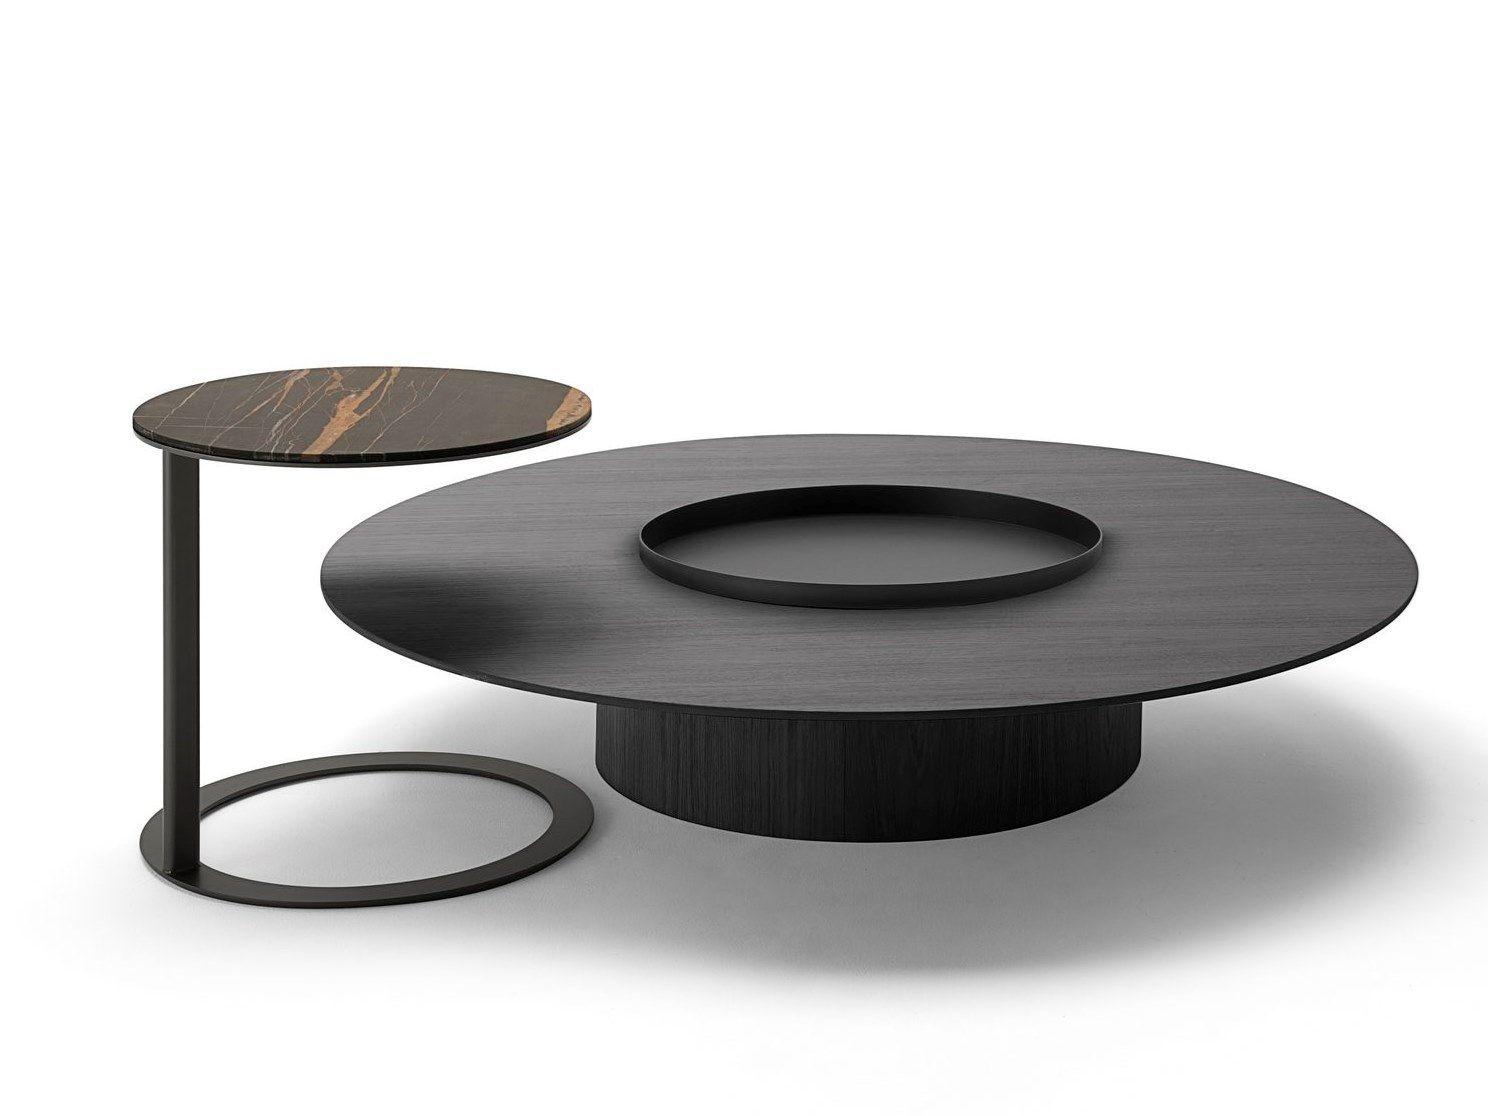 Round Side Table Tethys By Living Divani Design Gabriele E Oscar Buratti Tea Table Oak Coffee Table Tea Table Design [ 1116 x 1488 Pixel ]